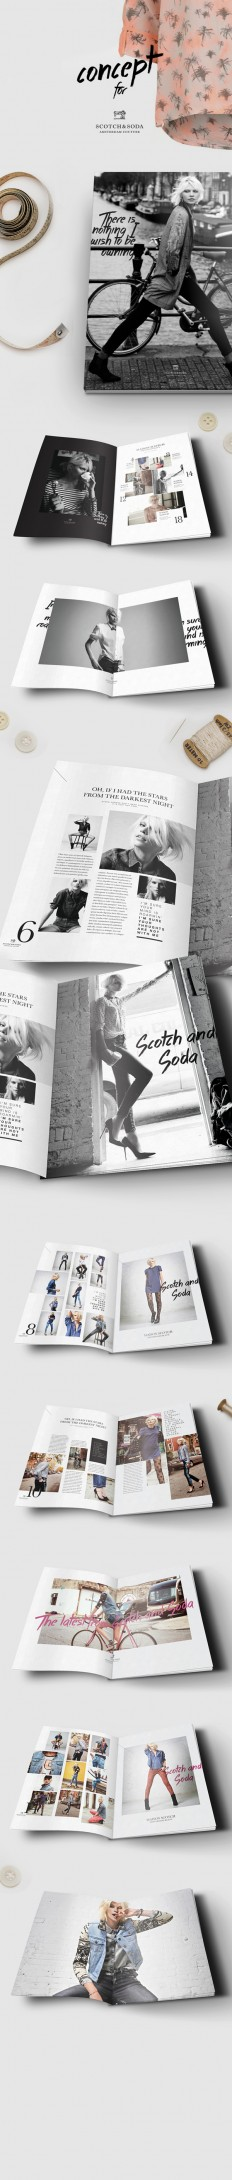 Scotch & Soda magazine/lookbook concept on